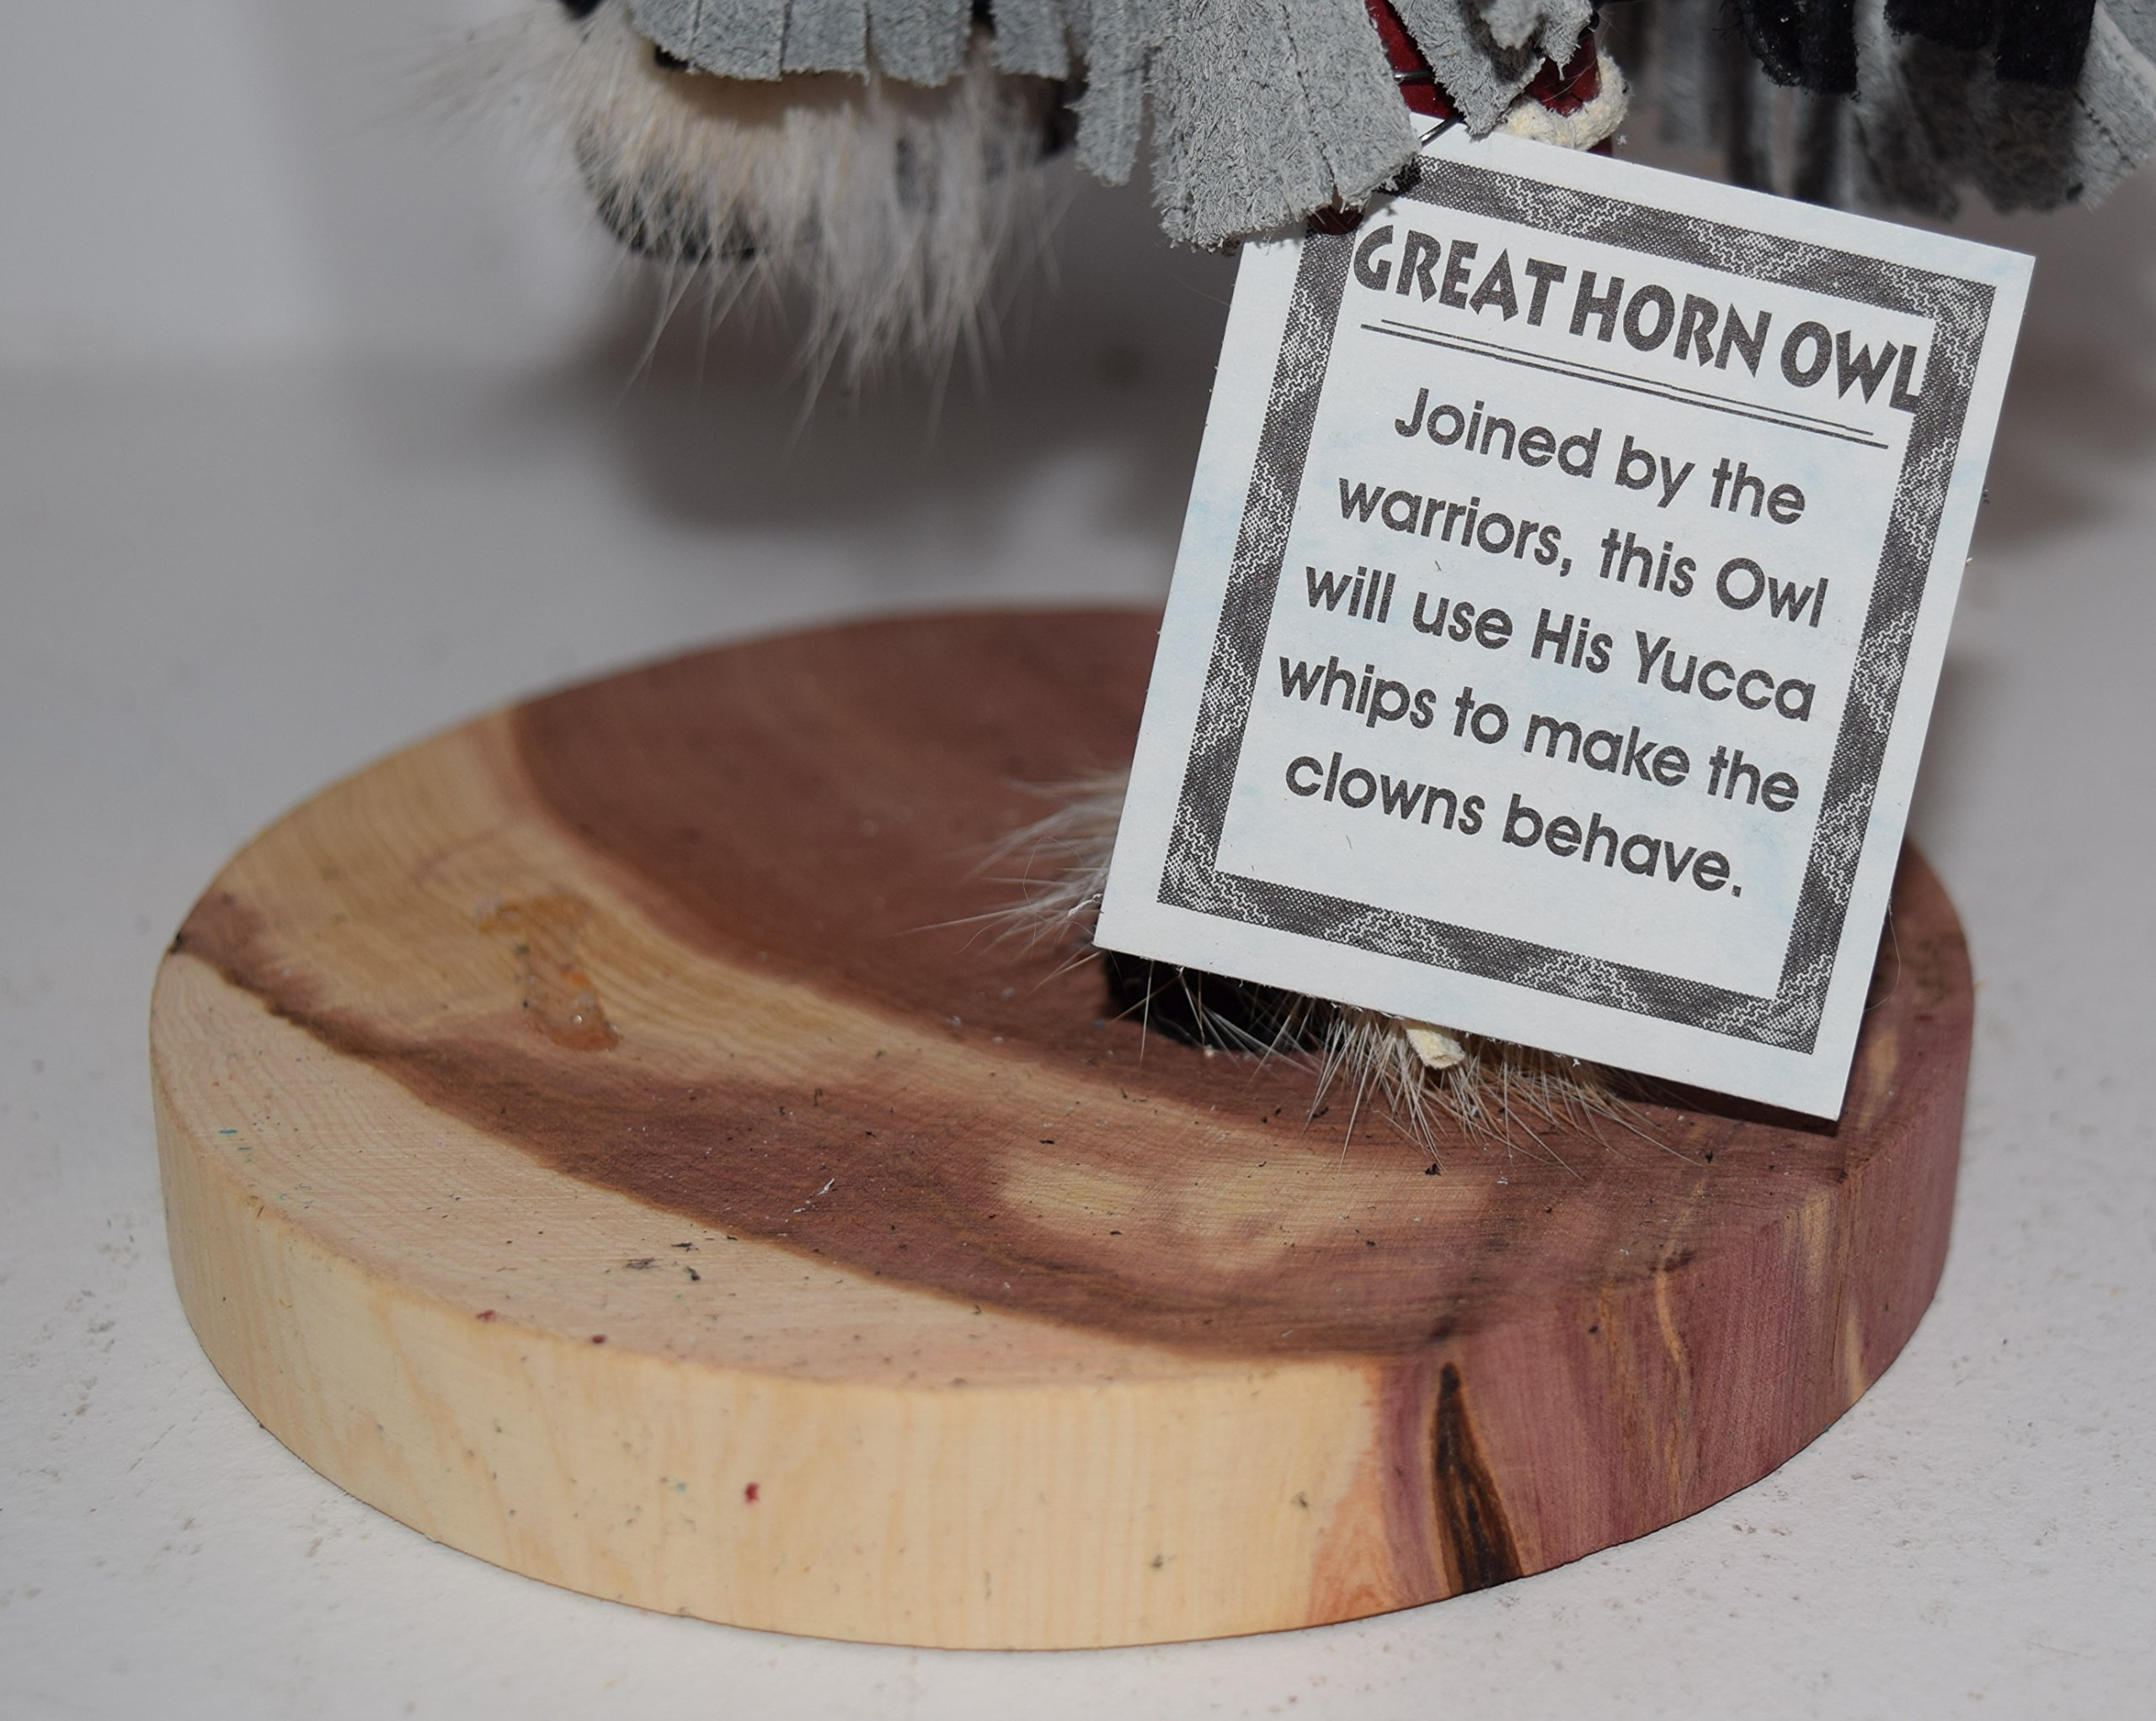 12 INCH Great Horn Owl Kachina by Kachina Country USA (Image #4)